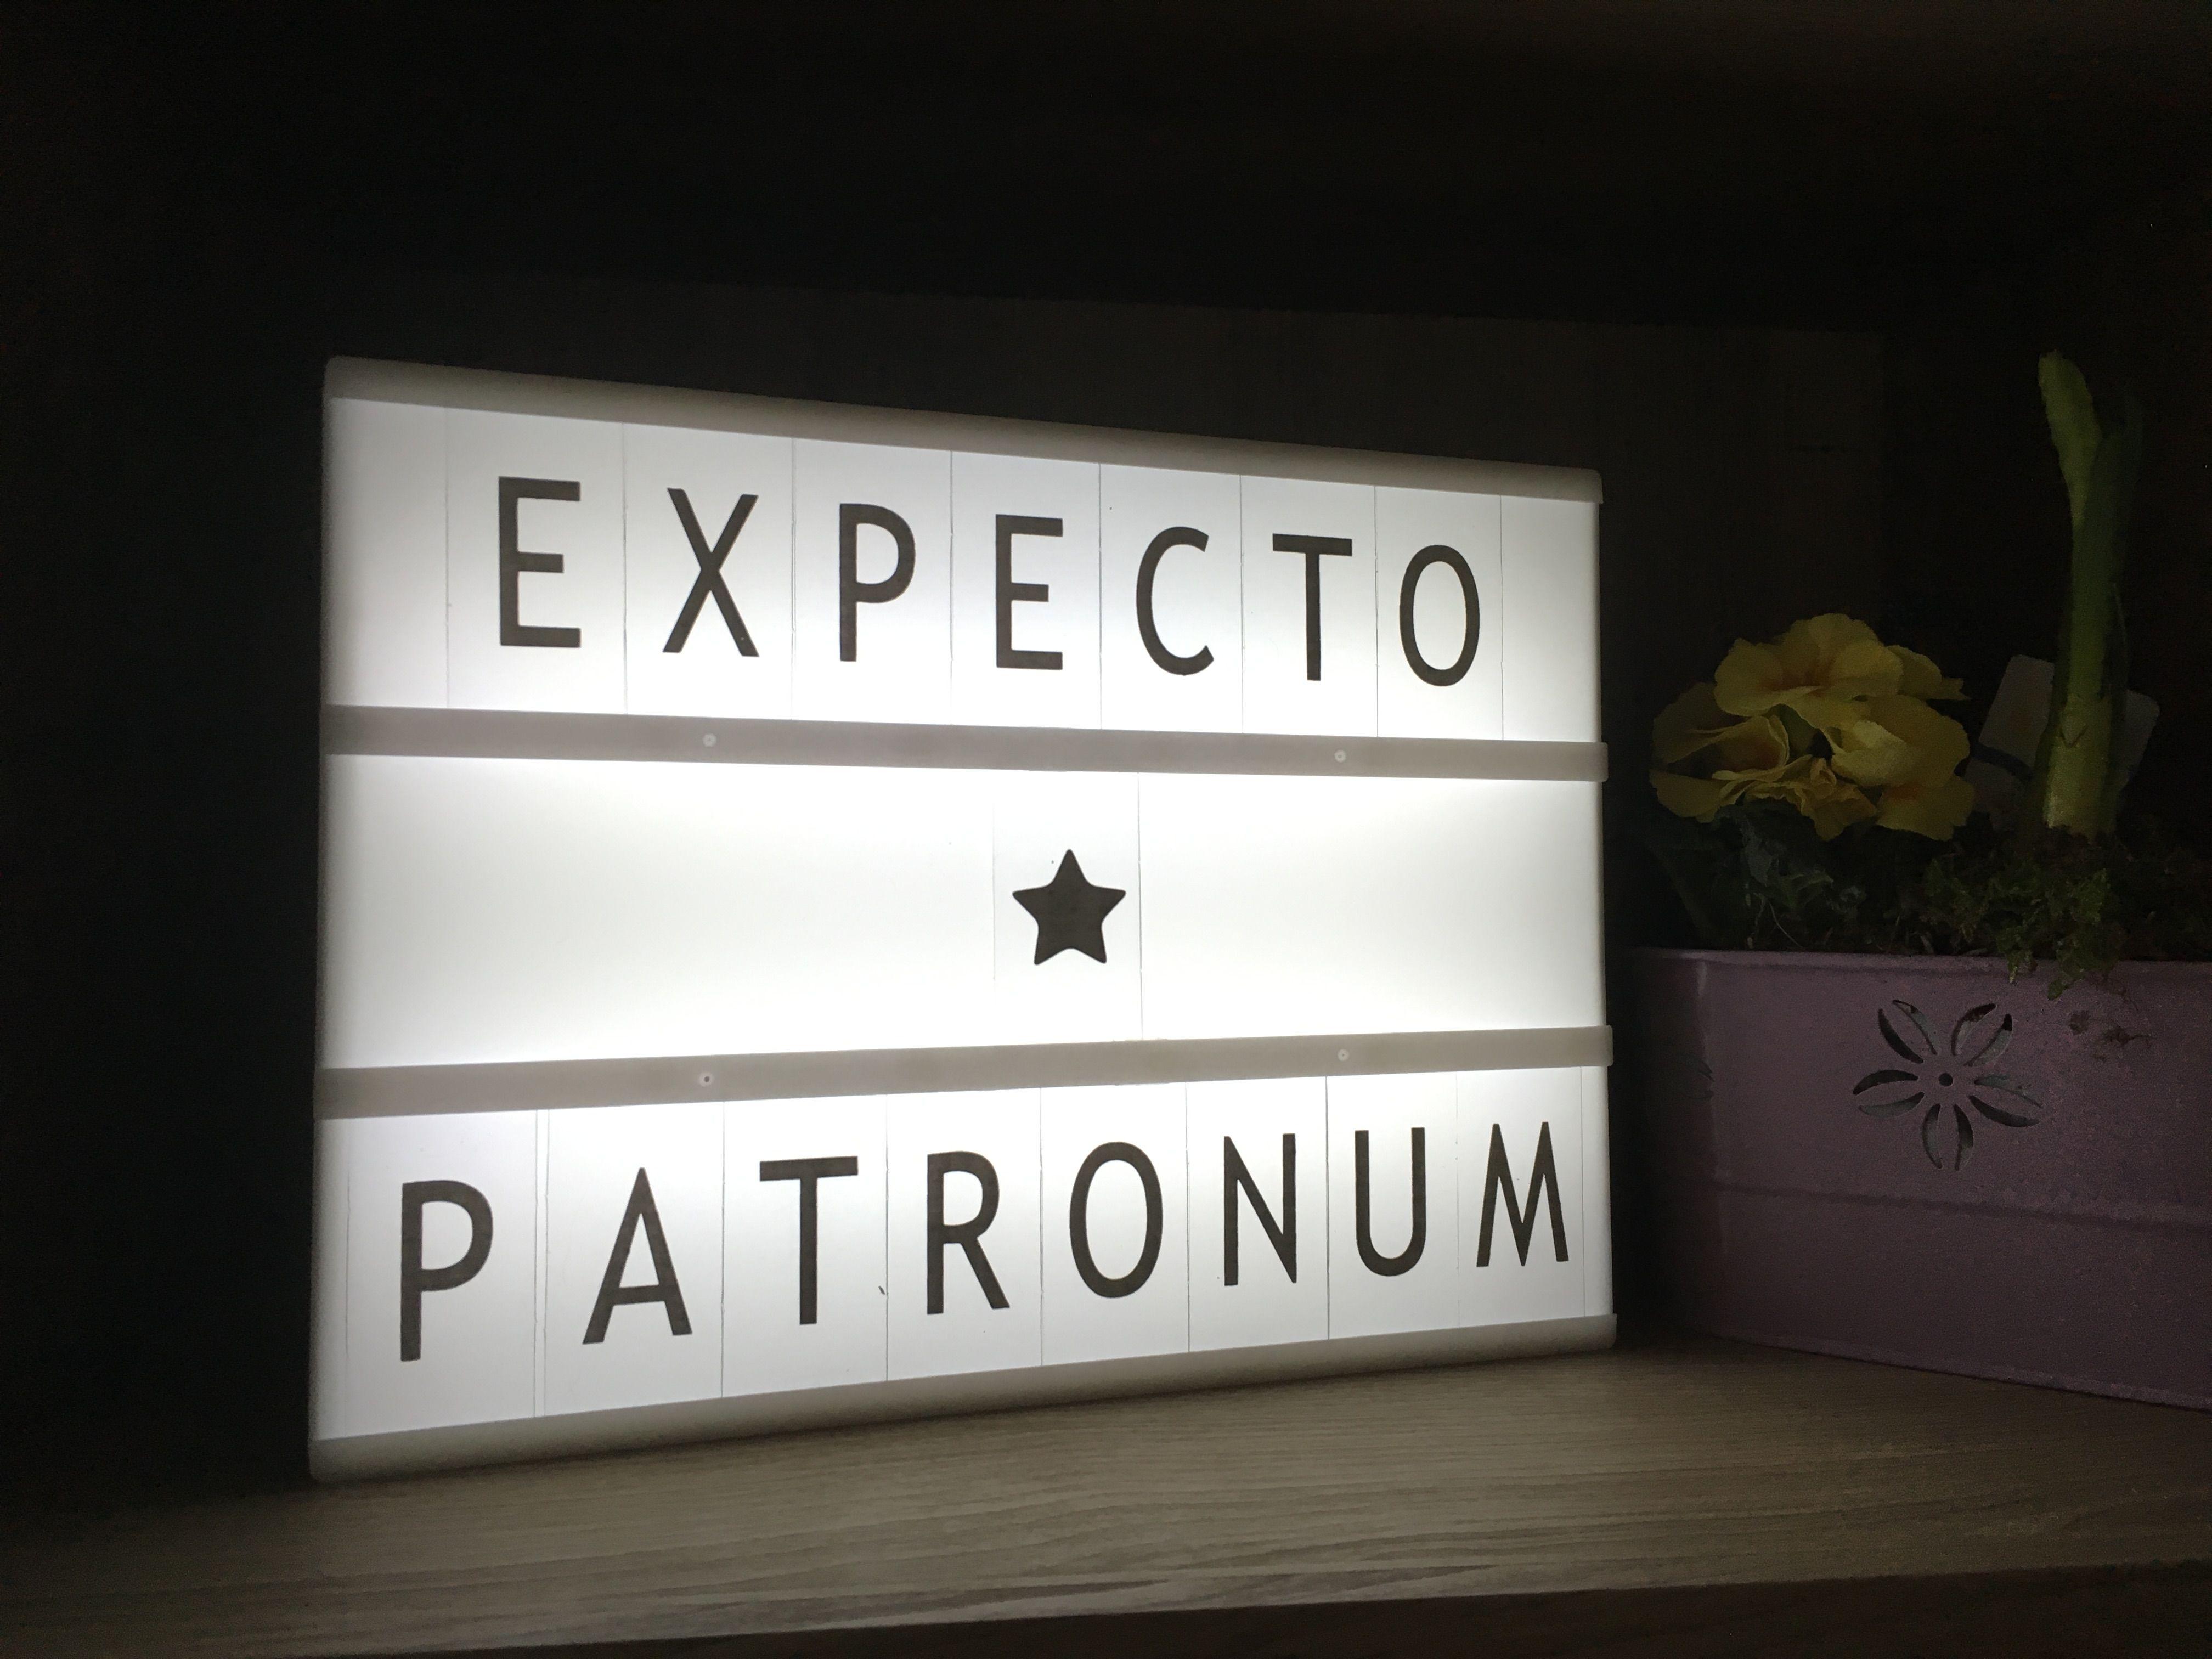 Lightbox Harry Potter   Light box, Cinema light box quotes, Light ...